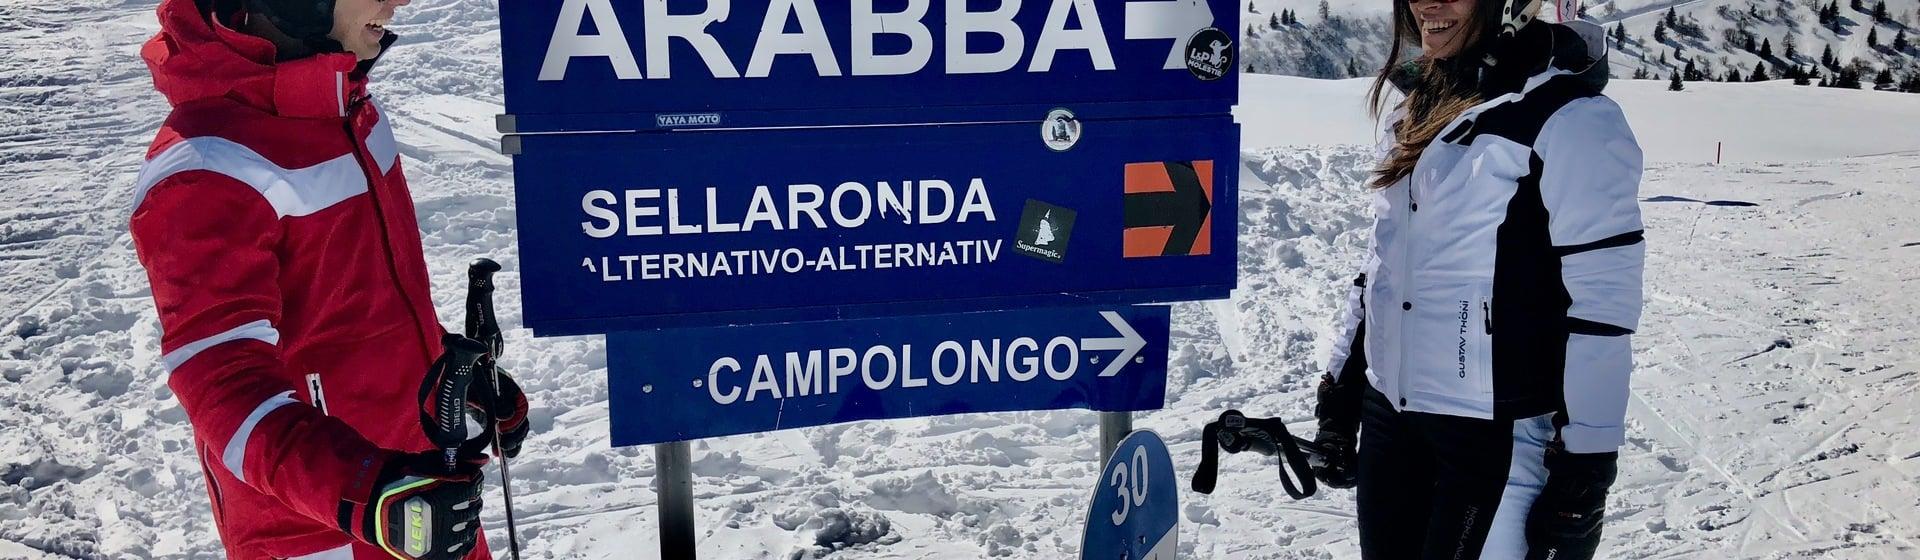 Winter Lifts-News 2021/2022 in Arabba - Marmolada Skiarea